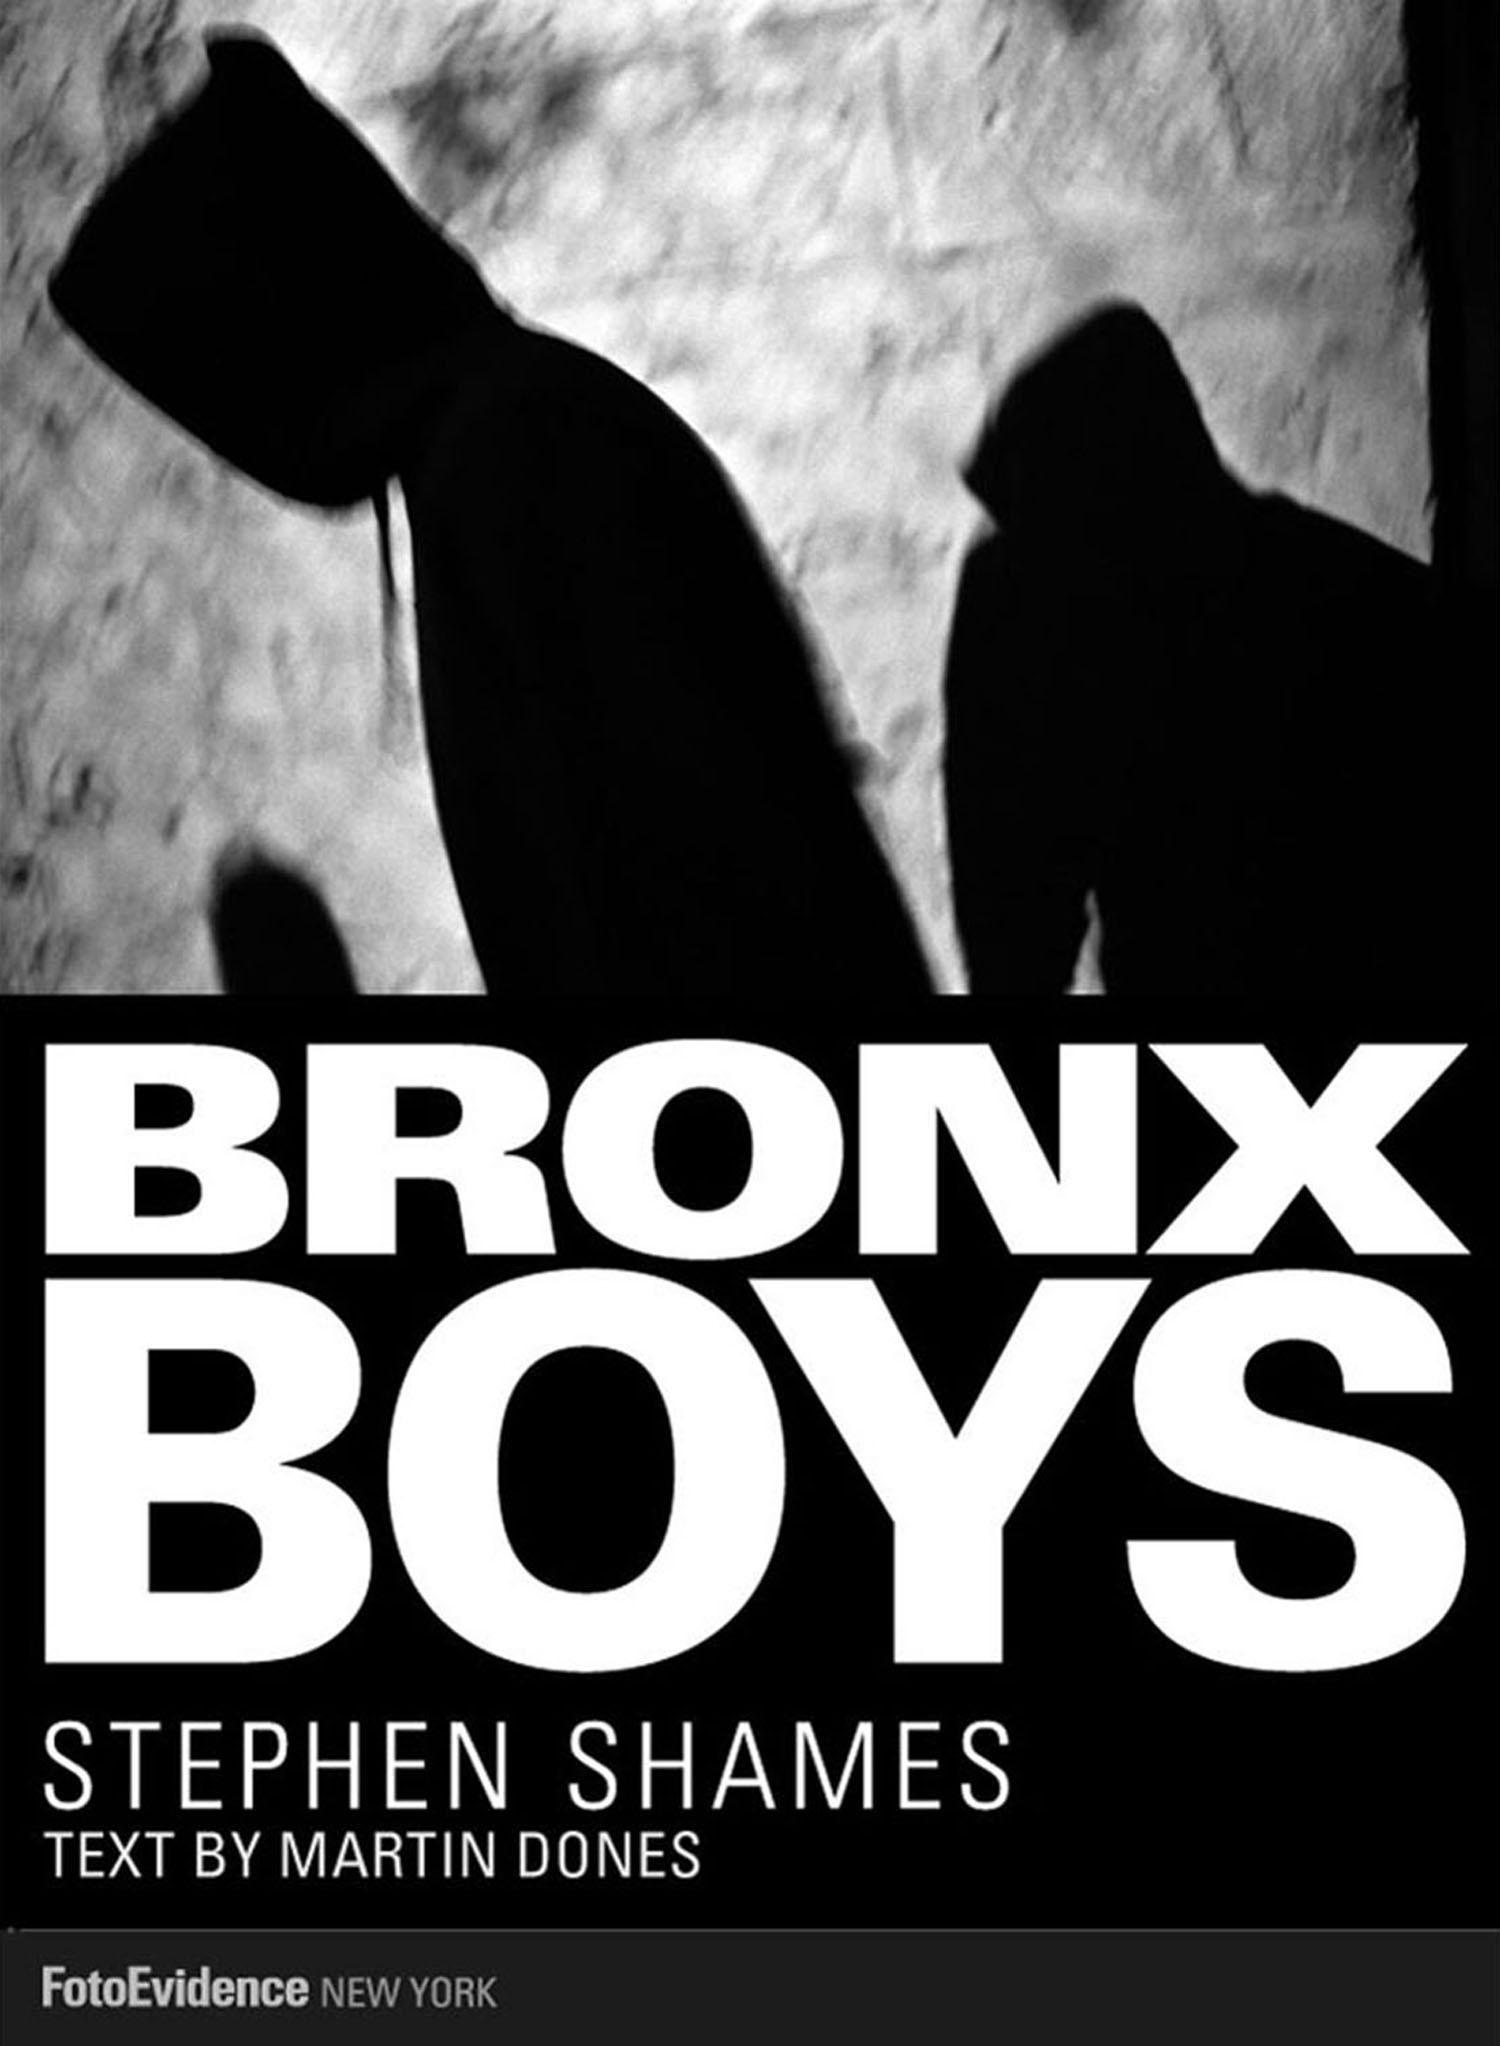 BronxBoys_Cover_FE_web.jpg